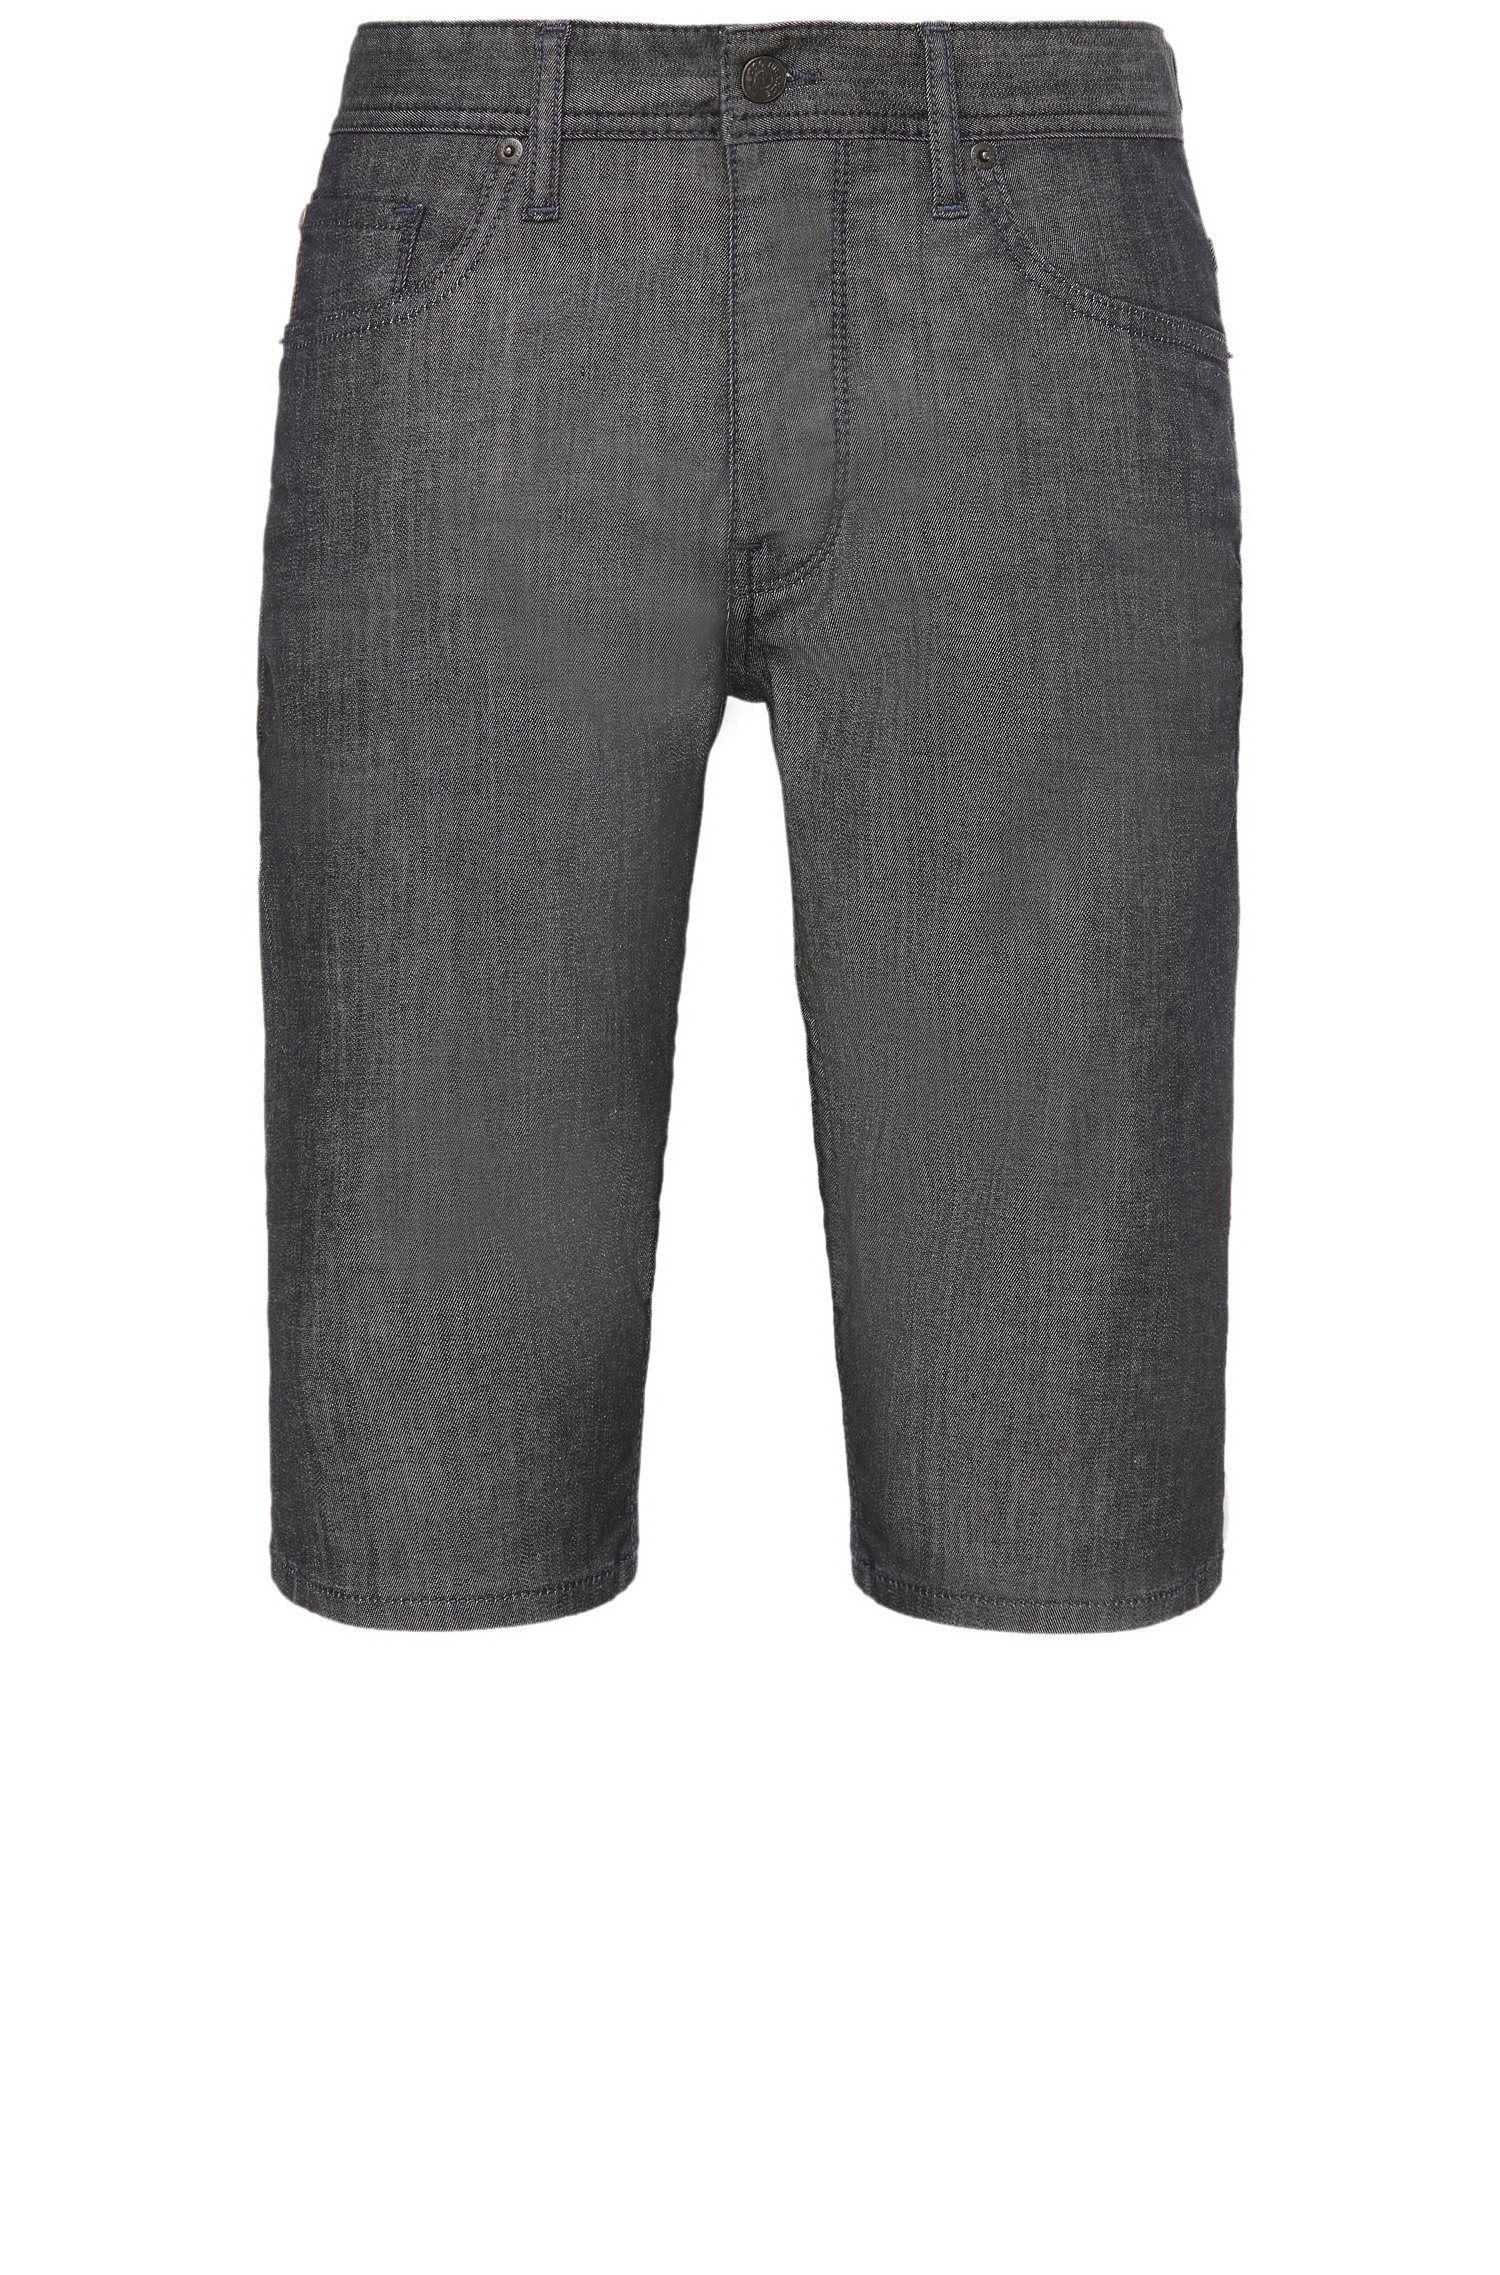 Shorts tapered fit en mezcla de algodón elástico: 'Orange90 Short'